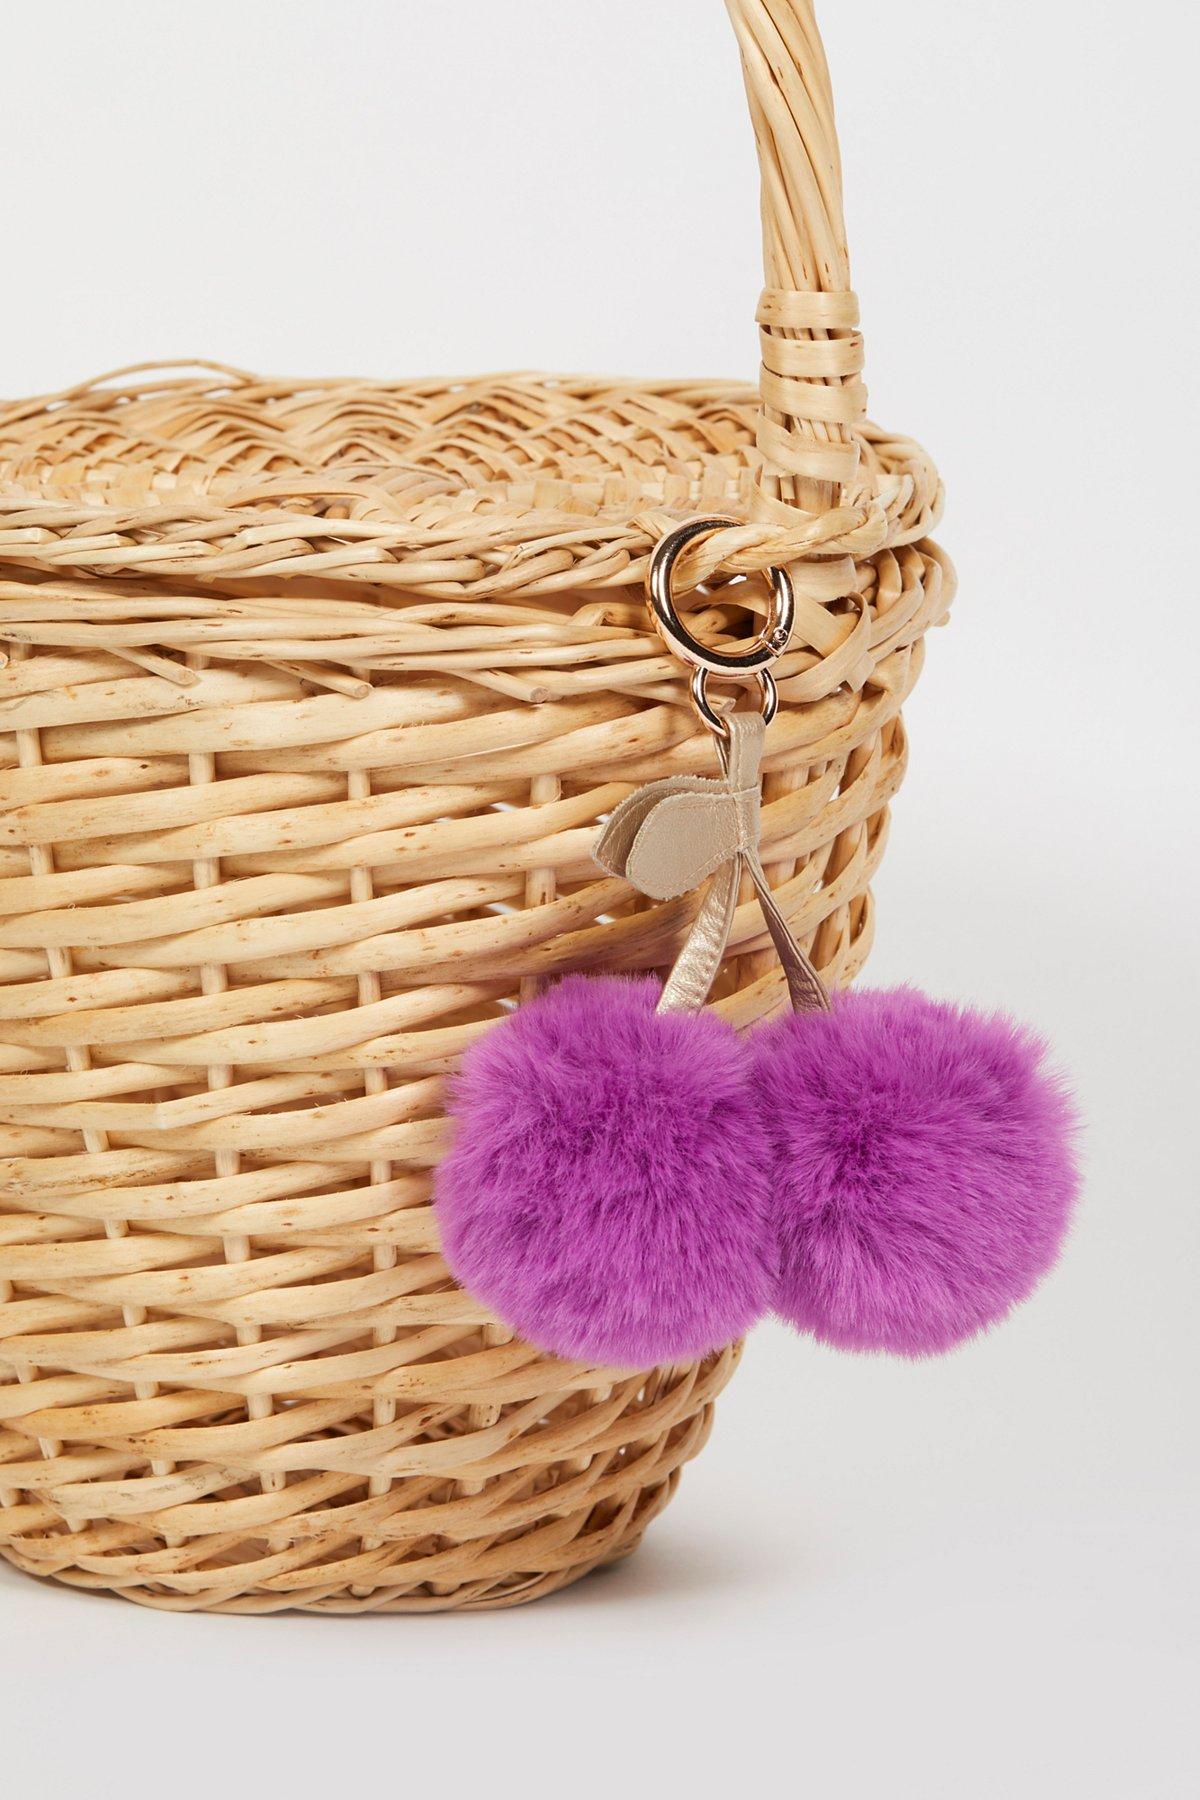 Faux Fur Cherry Pompom Bag Charm